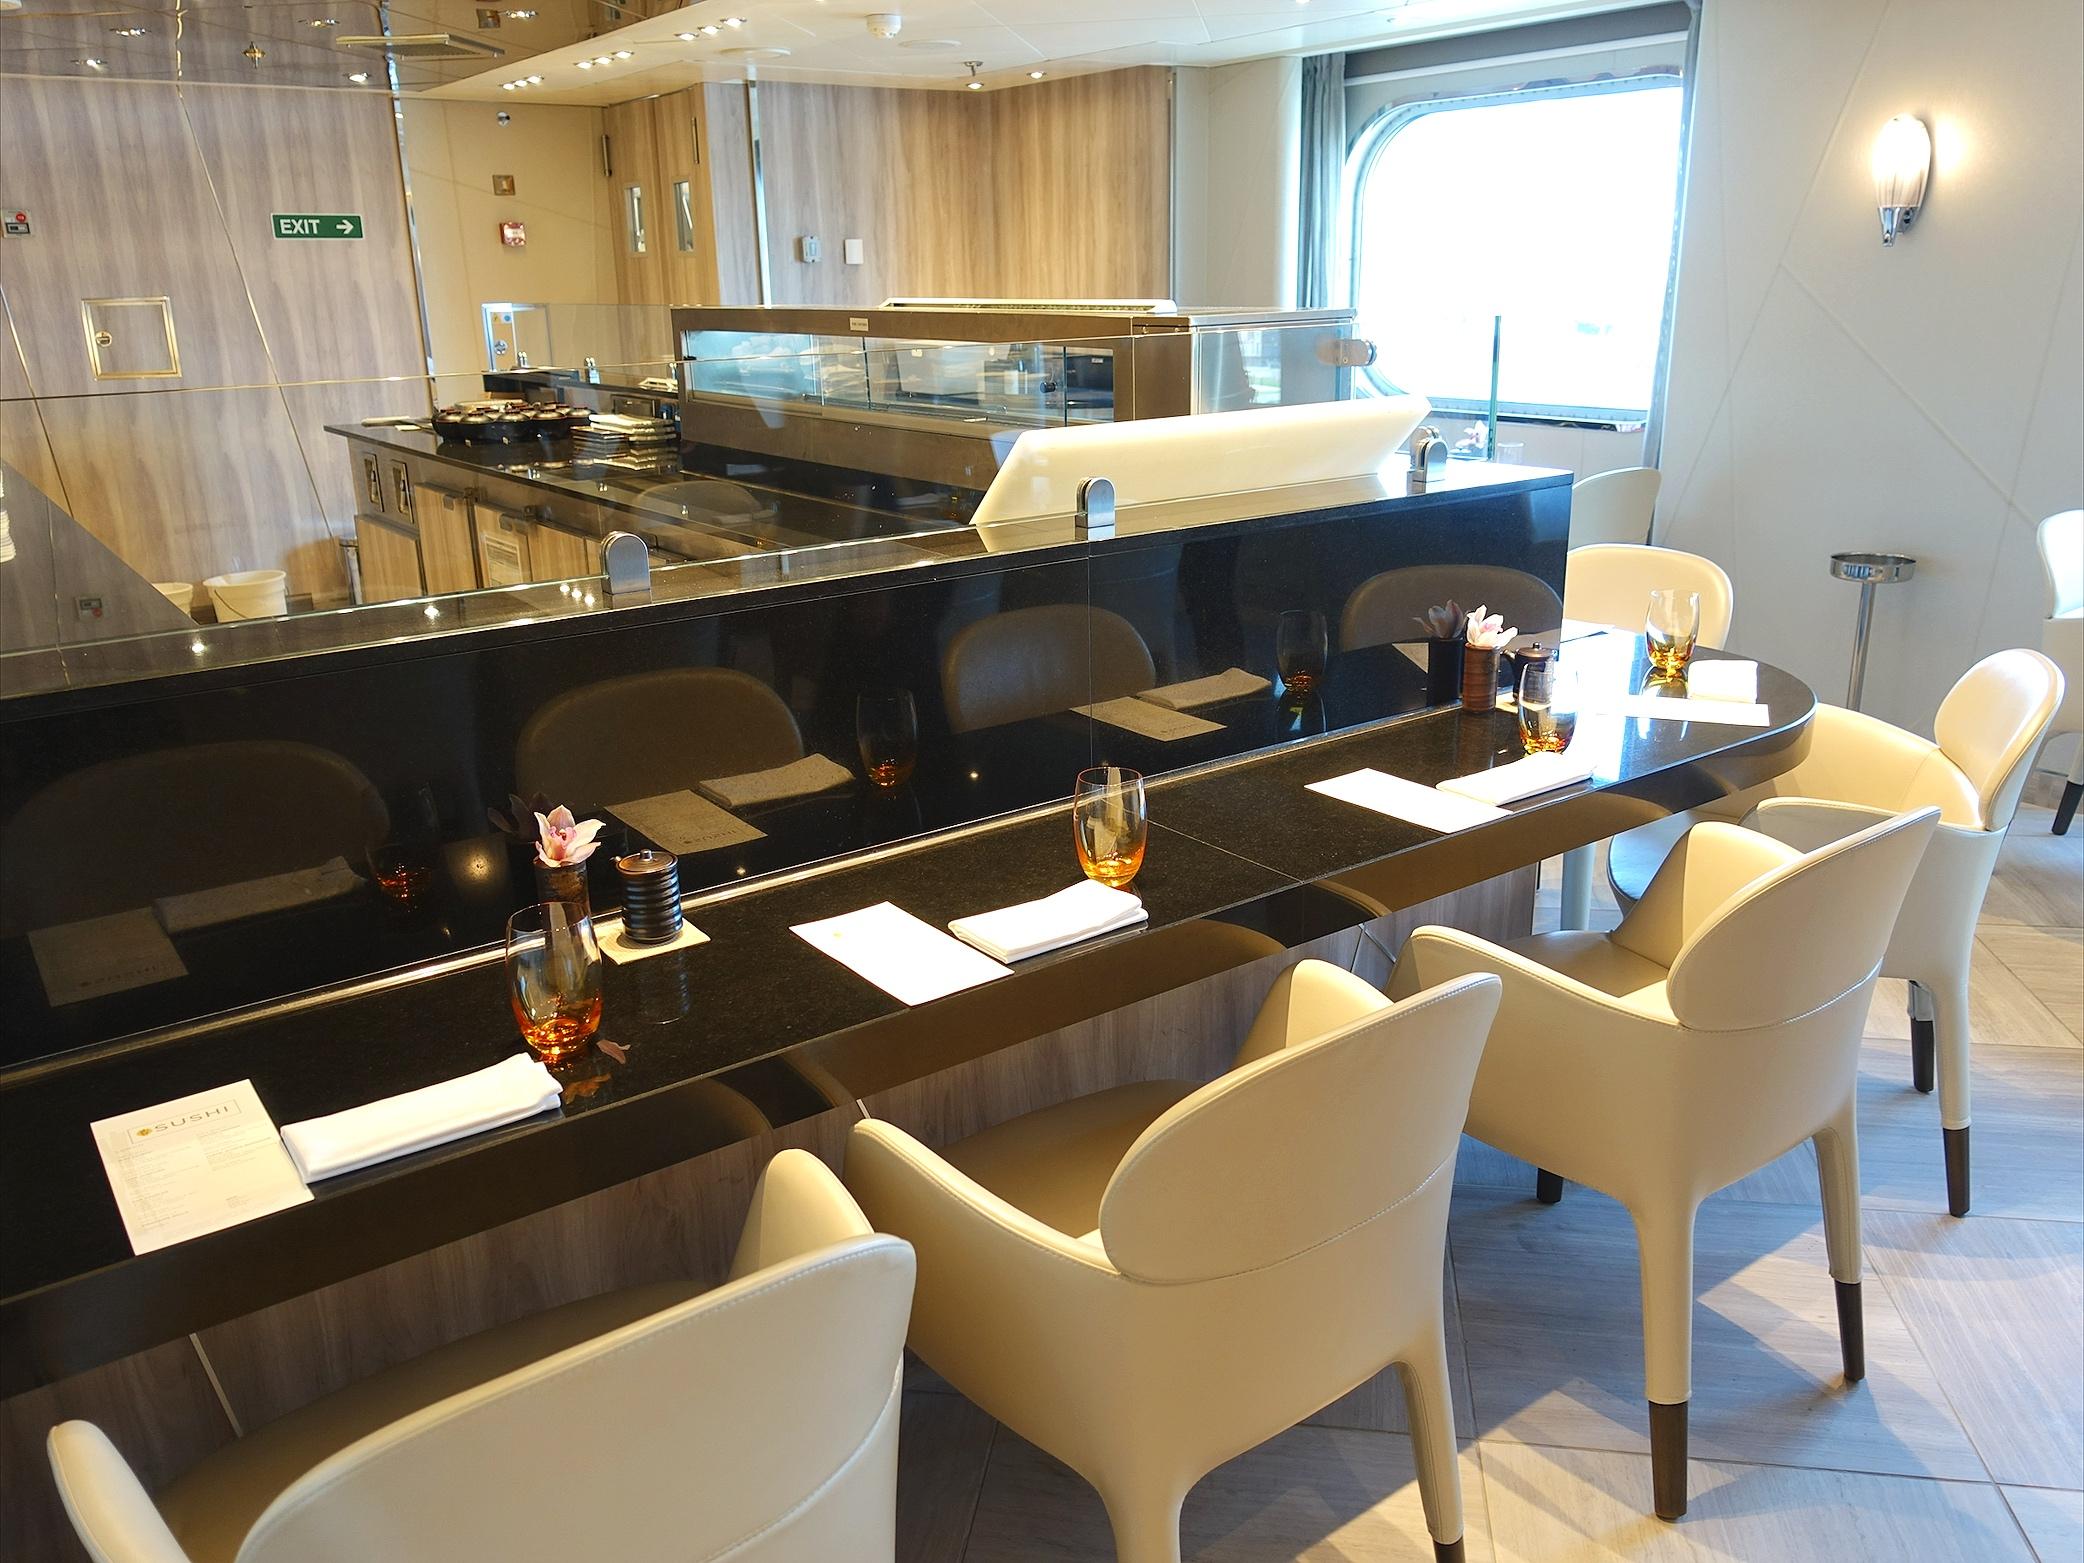 The Sushi food preparation bar.